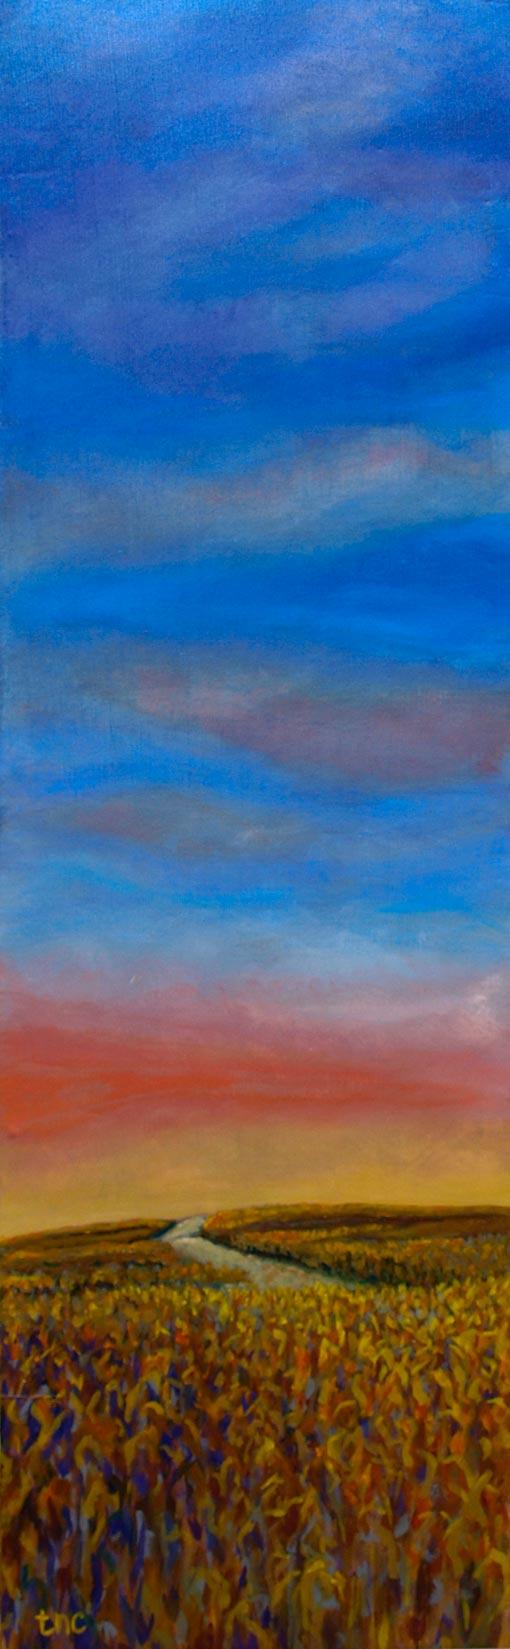 "Homeward Bound • Gallery Wrap 11x35"" • Original Acrylic Painting on Canvas"